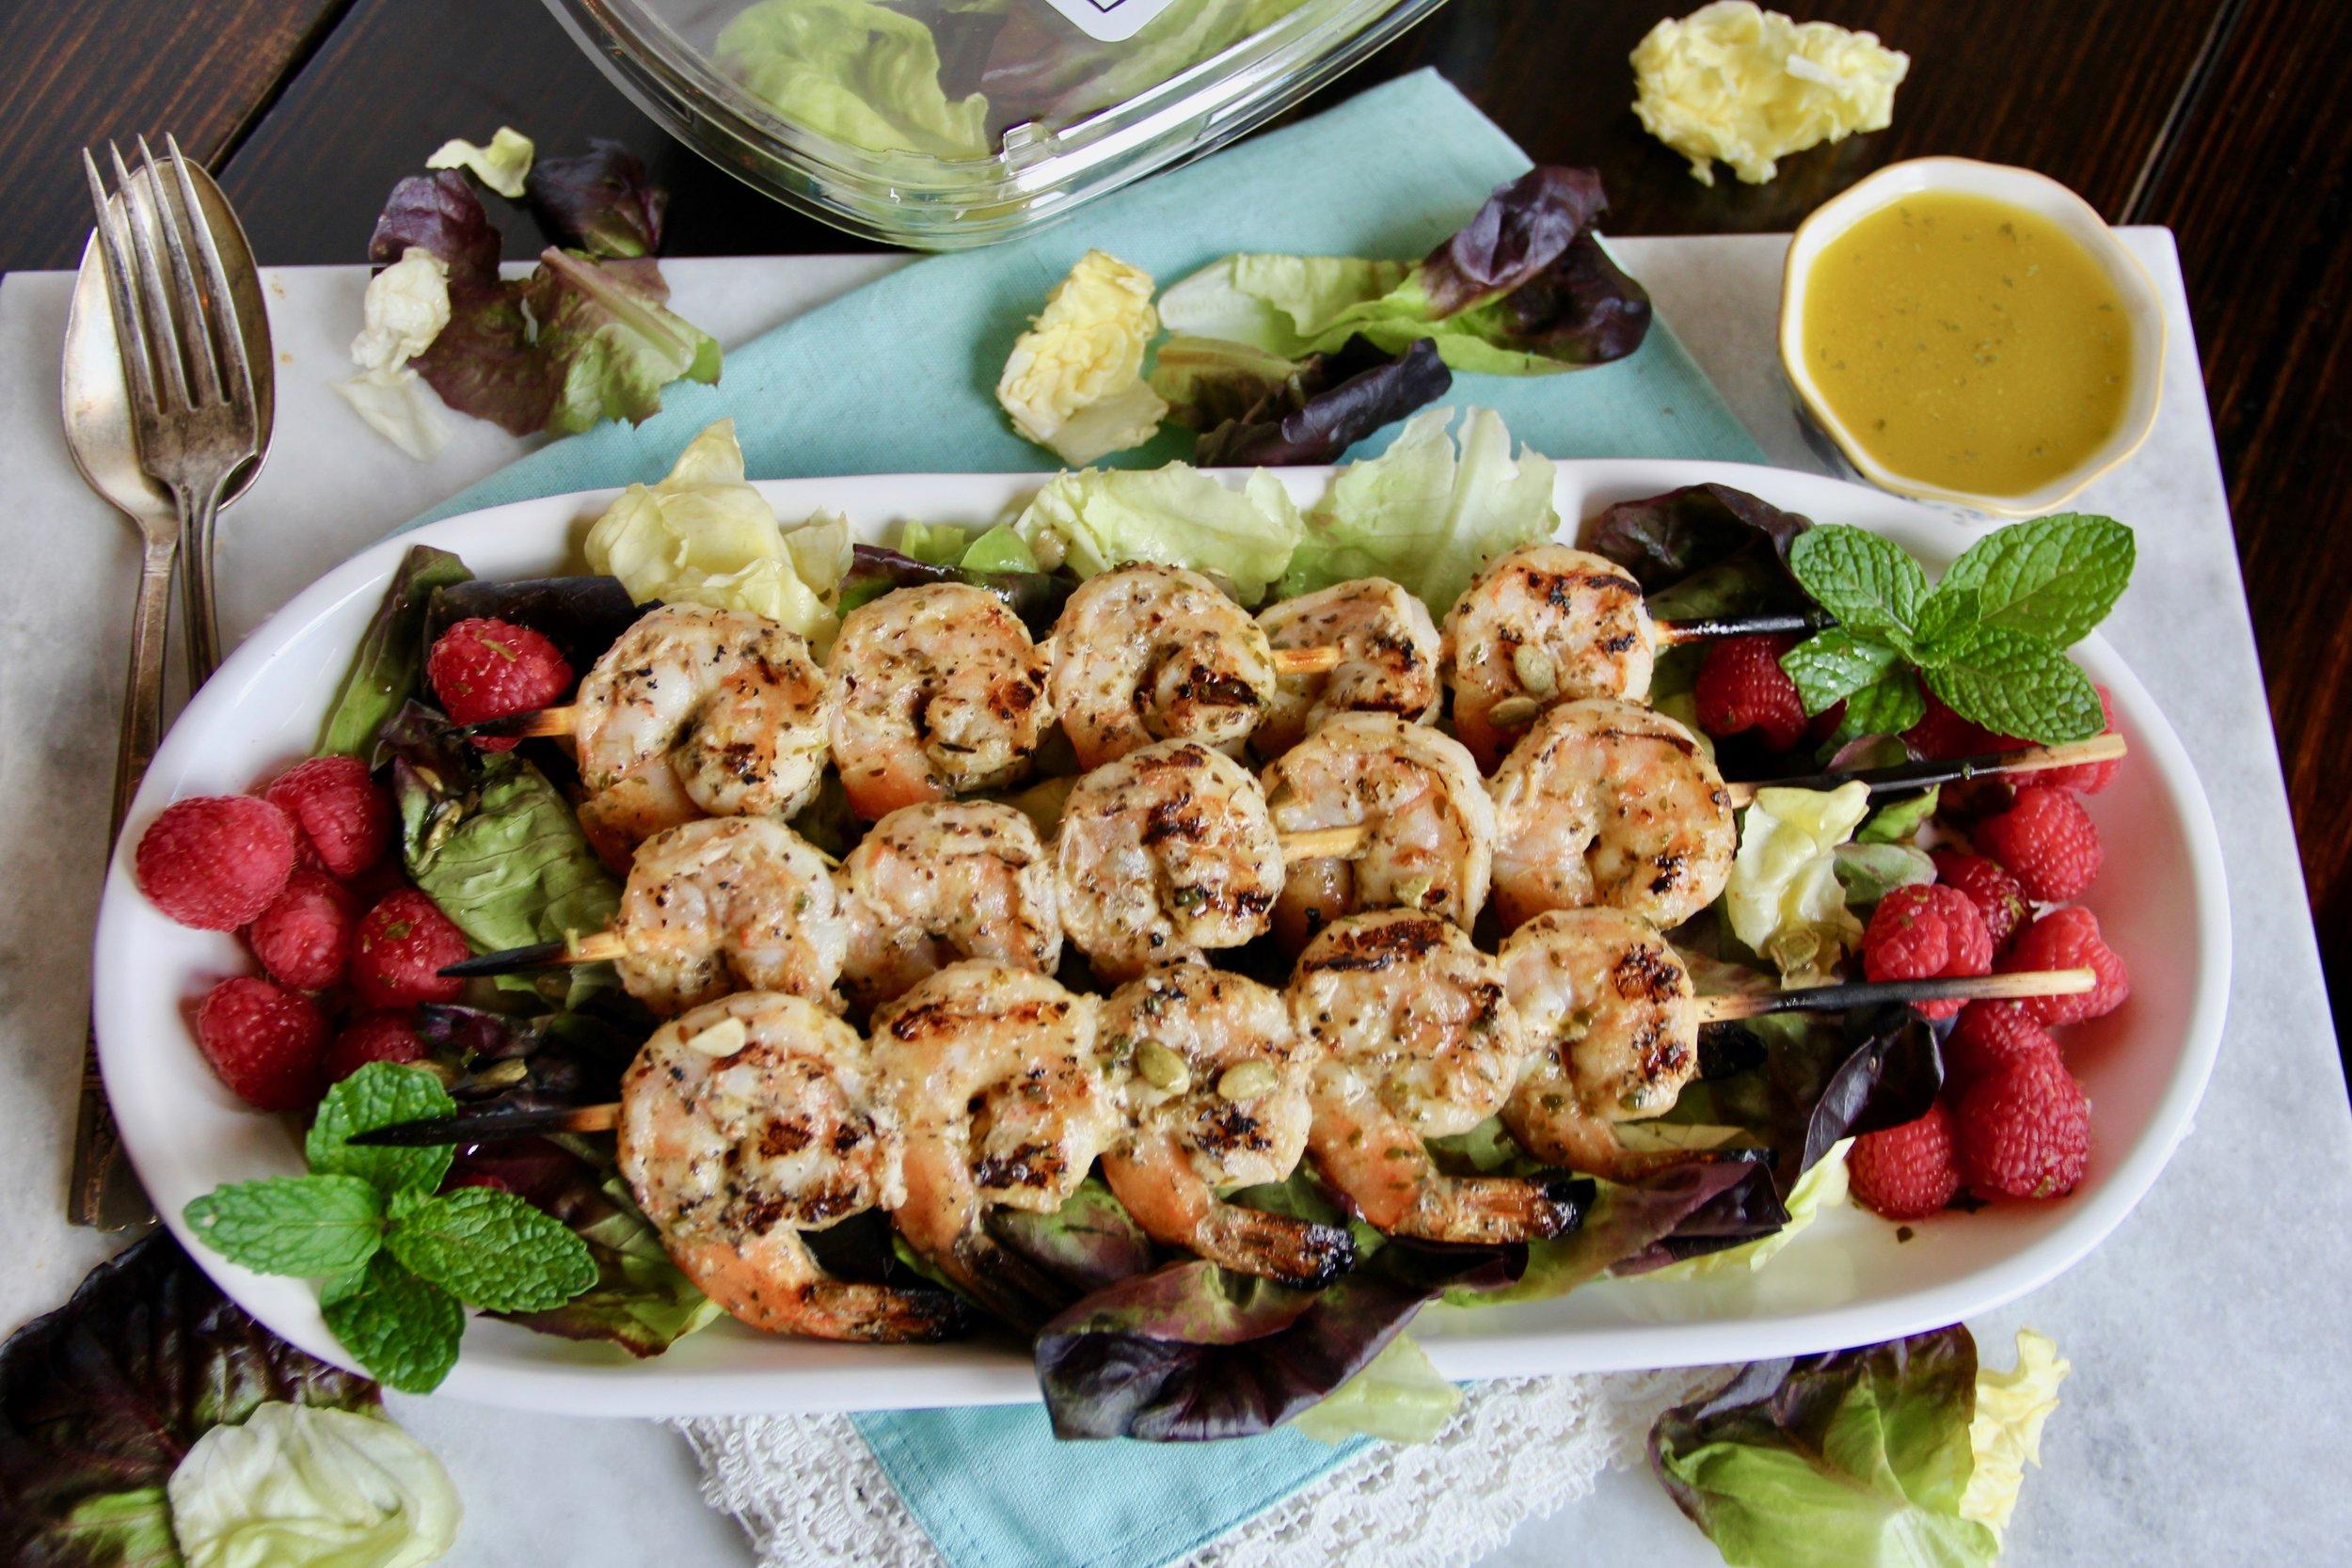 Grilled Shrimp Salad with Cilantro Mint Dressing